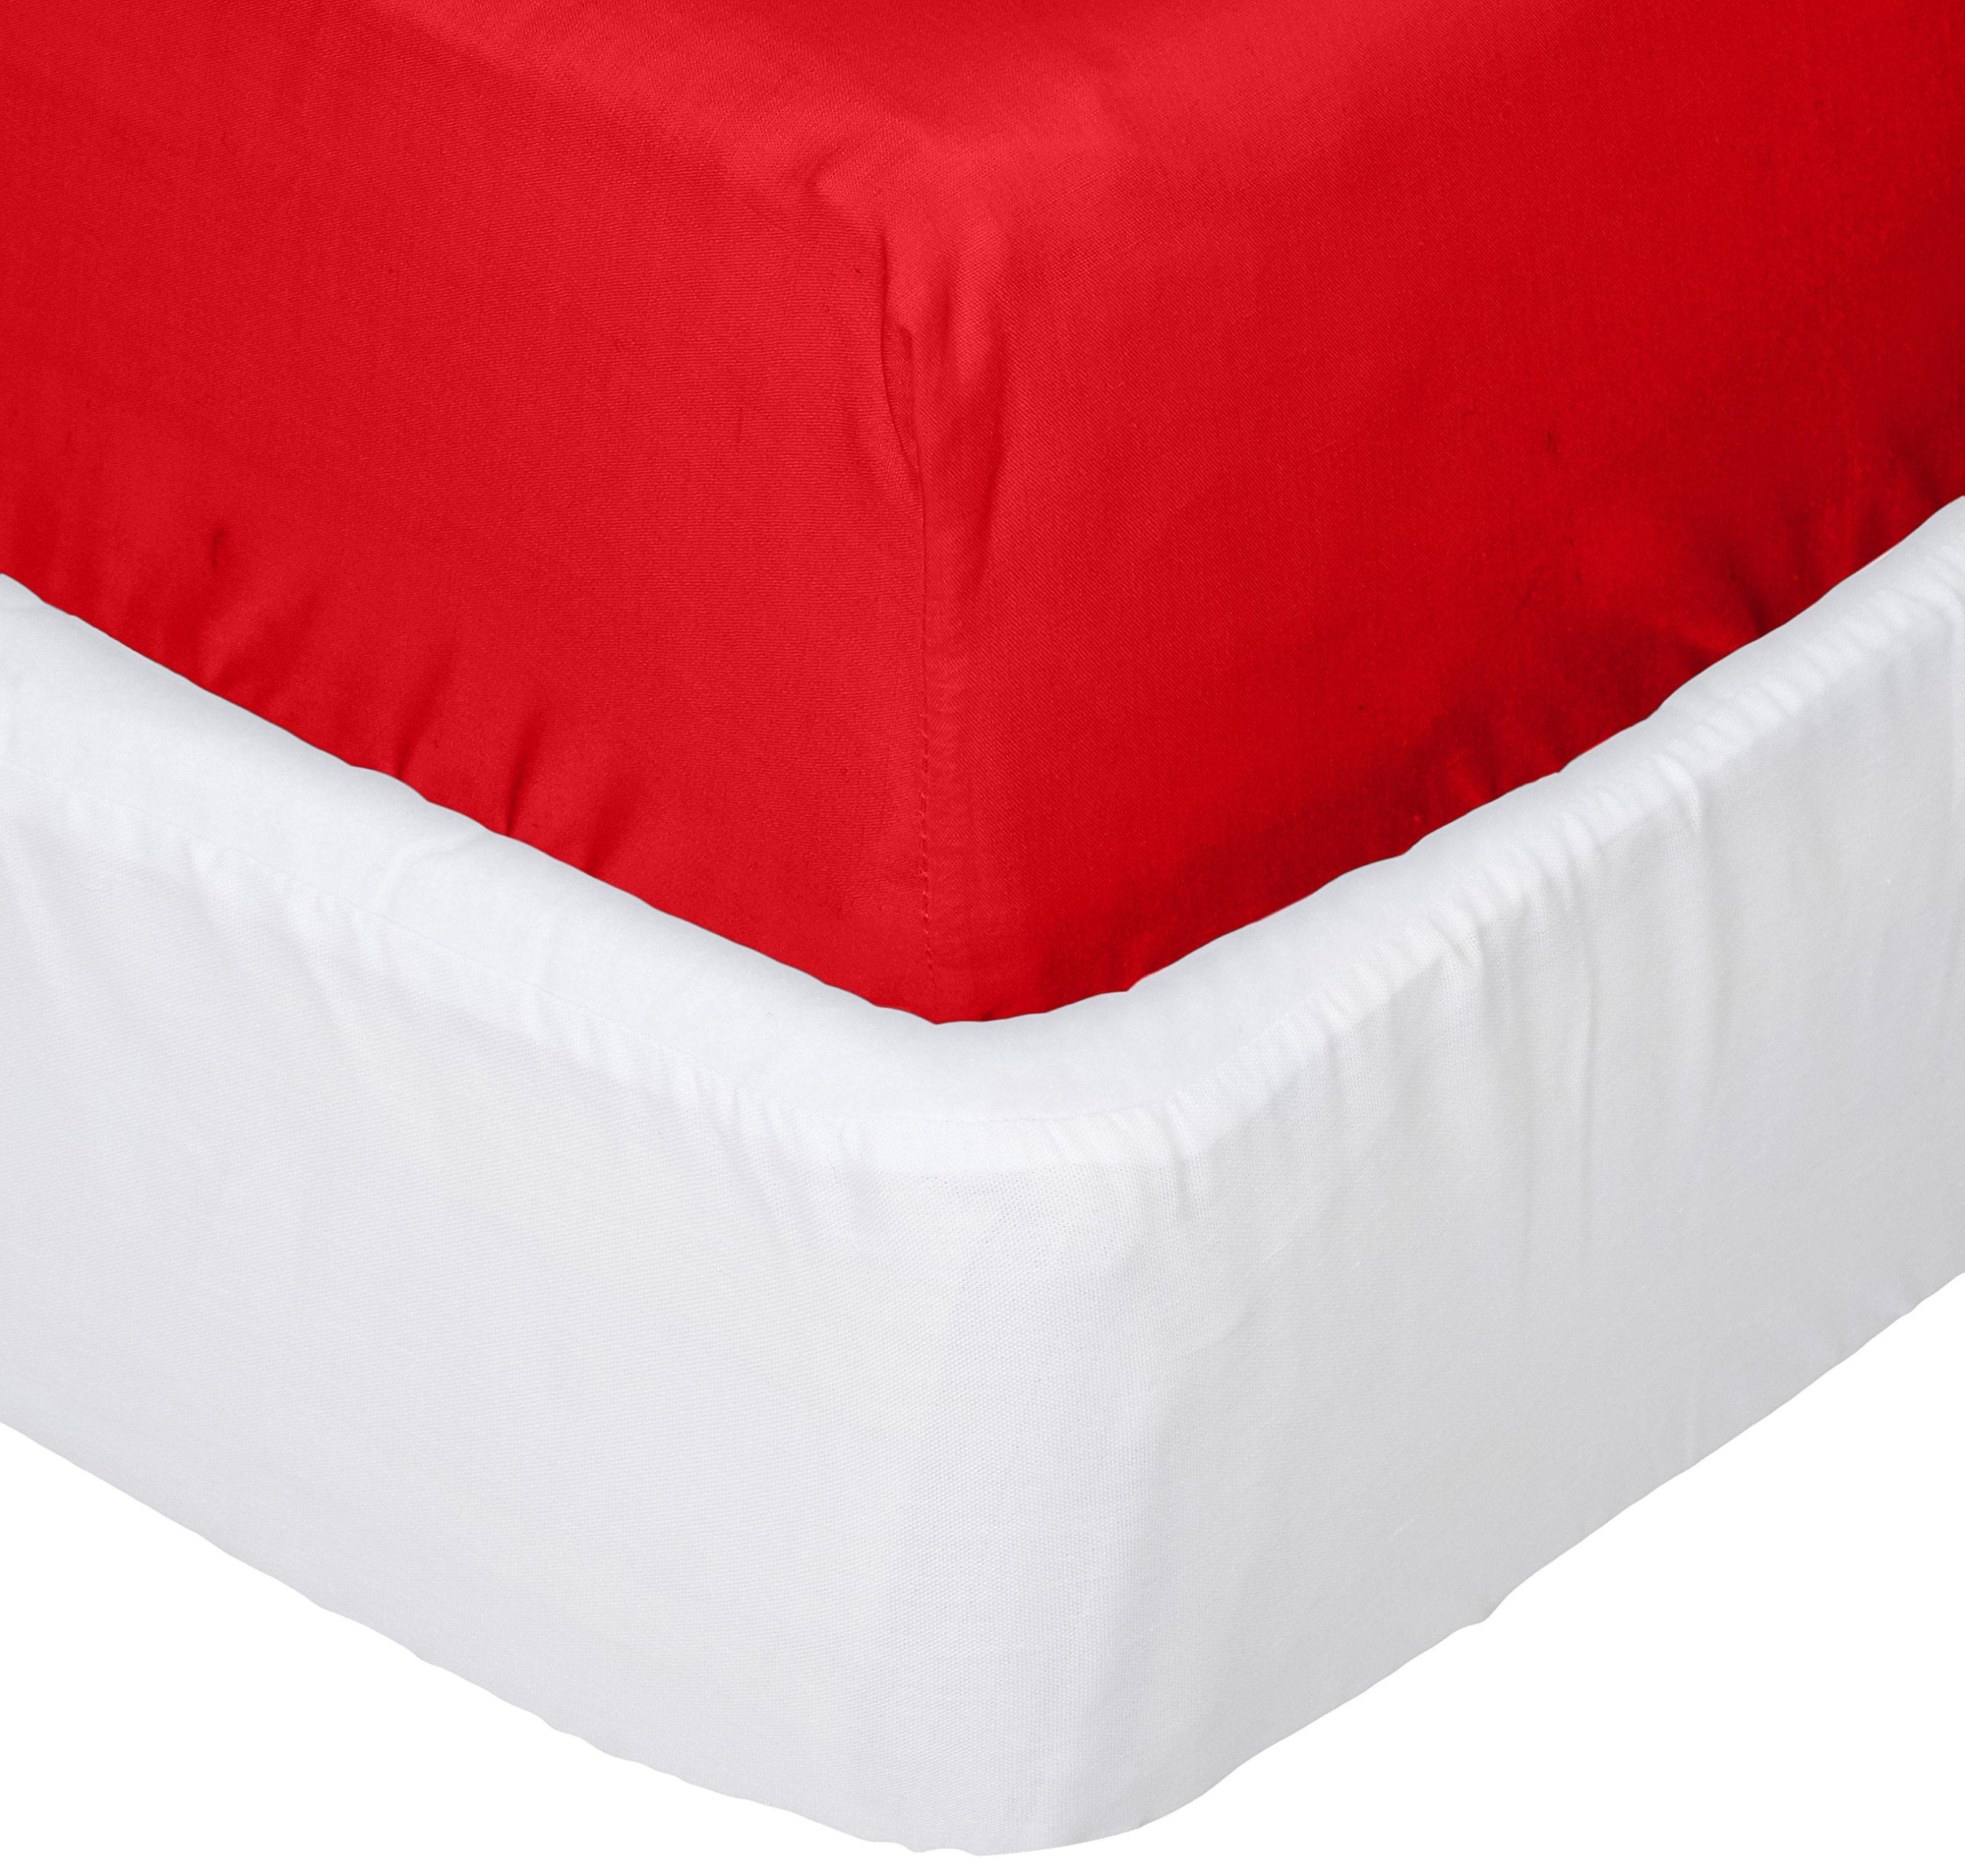 aBaby Crib Mattress Protector and Sheet Combo, Red